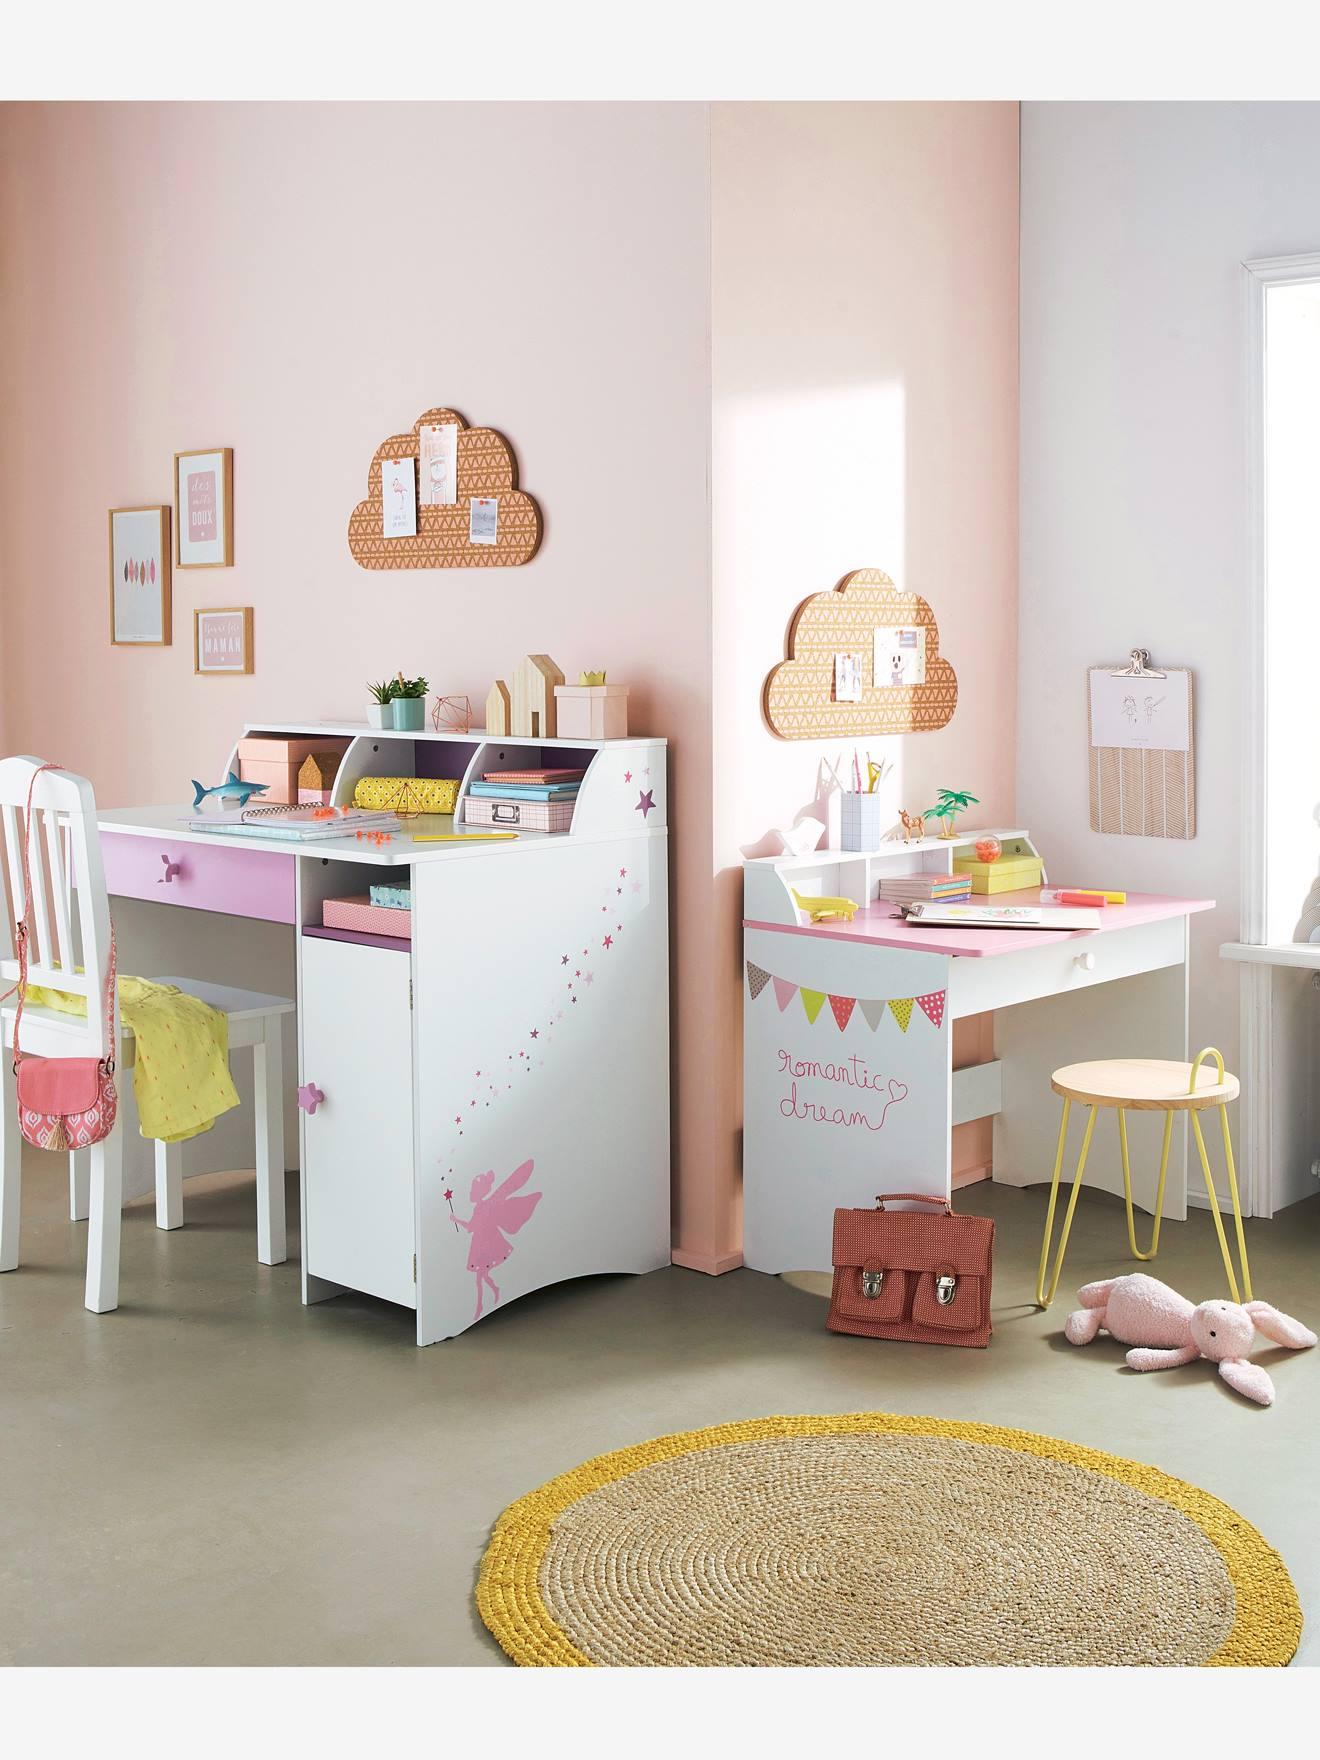 bureau junior fille perfect chandail rplique brendan gallagher classique de la lnh with bureau. Black Bedroom Furniture Sets. Home Design Ideas